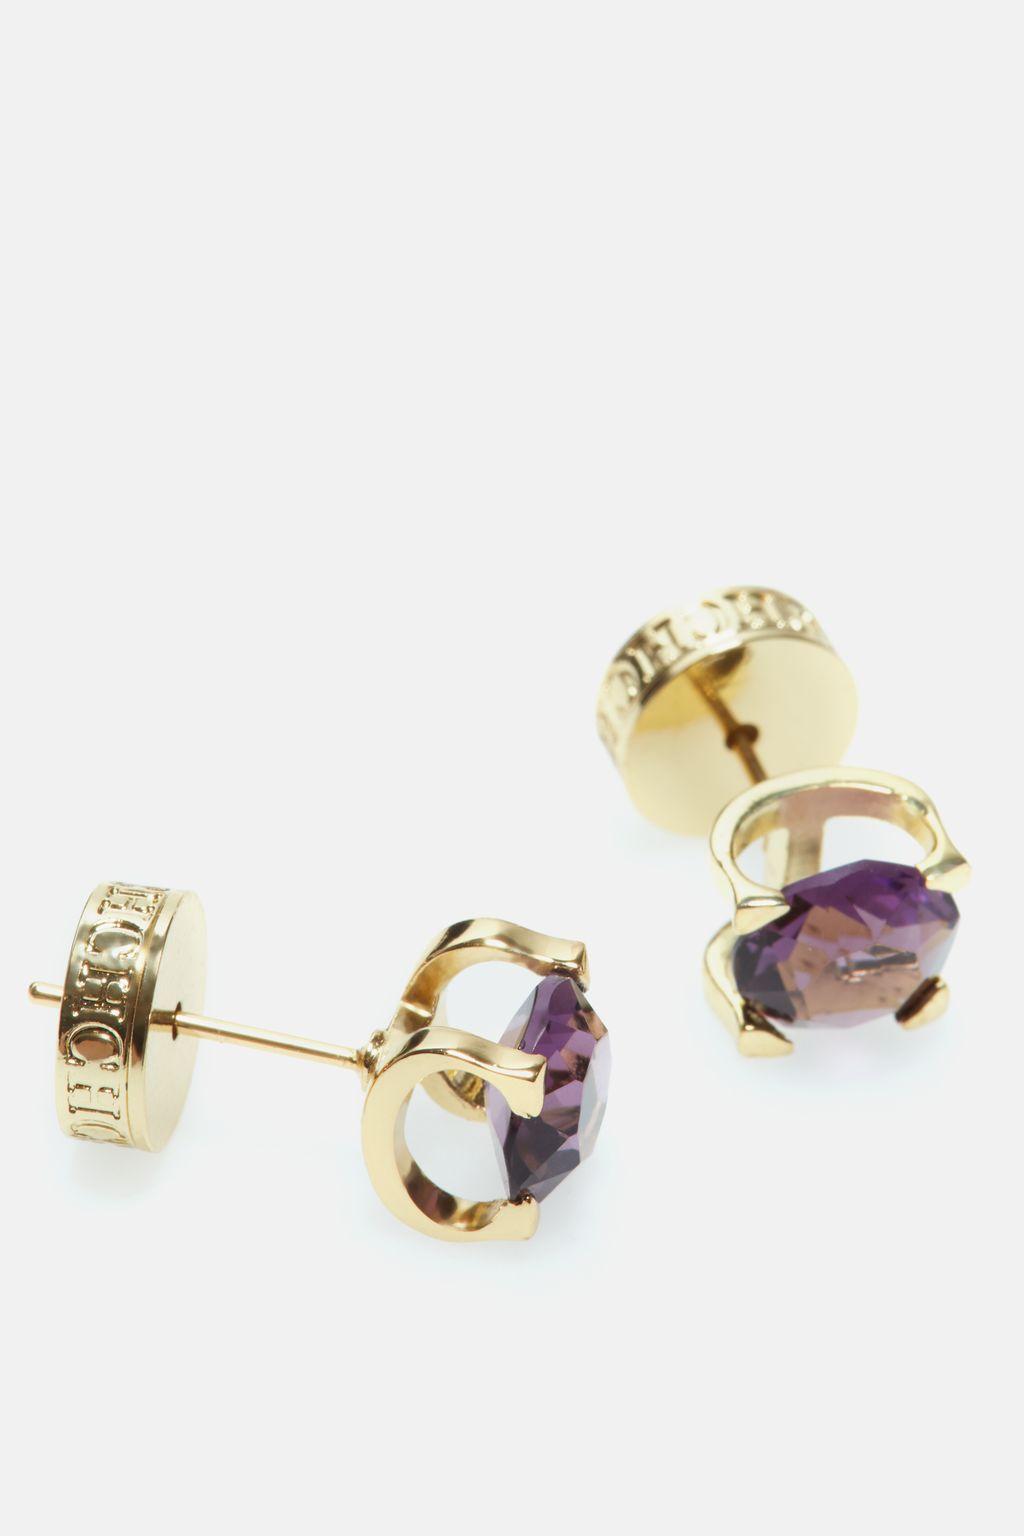 Diamond Insignia earrings